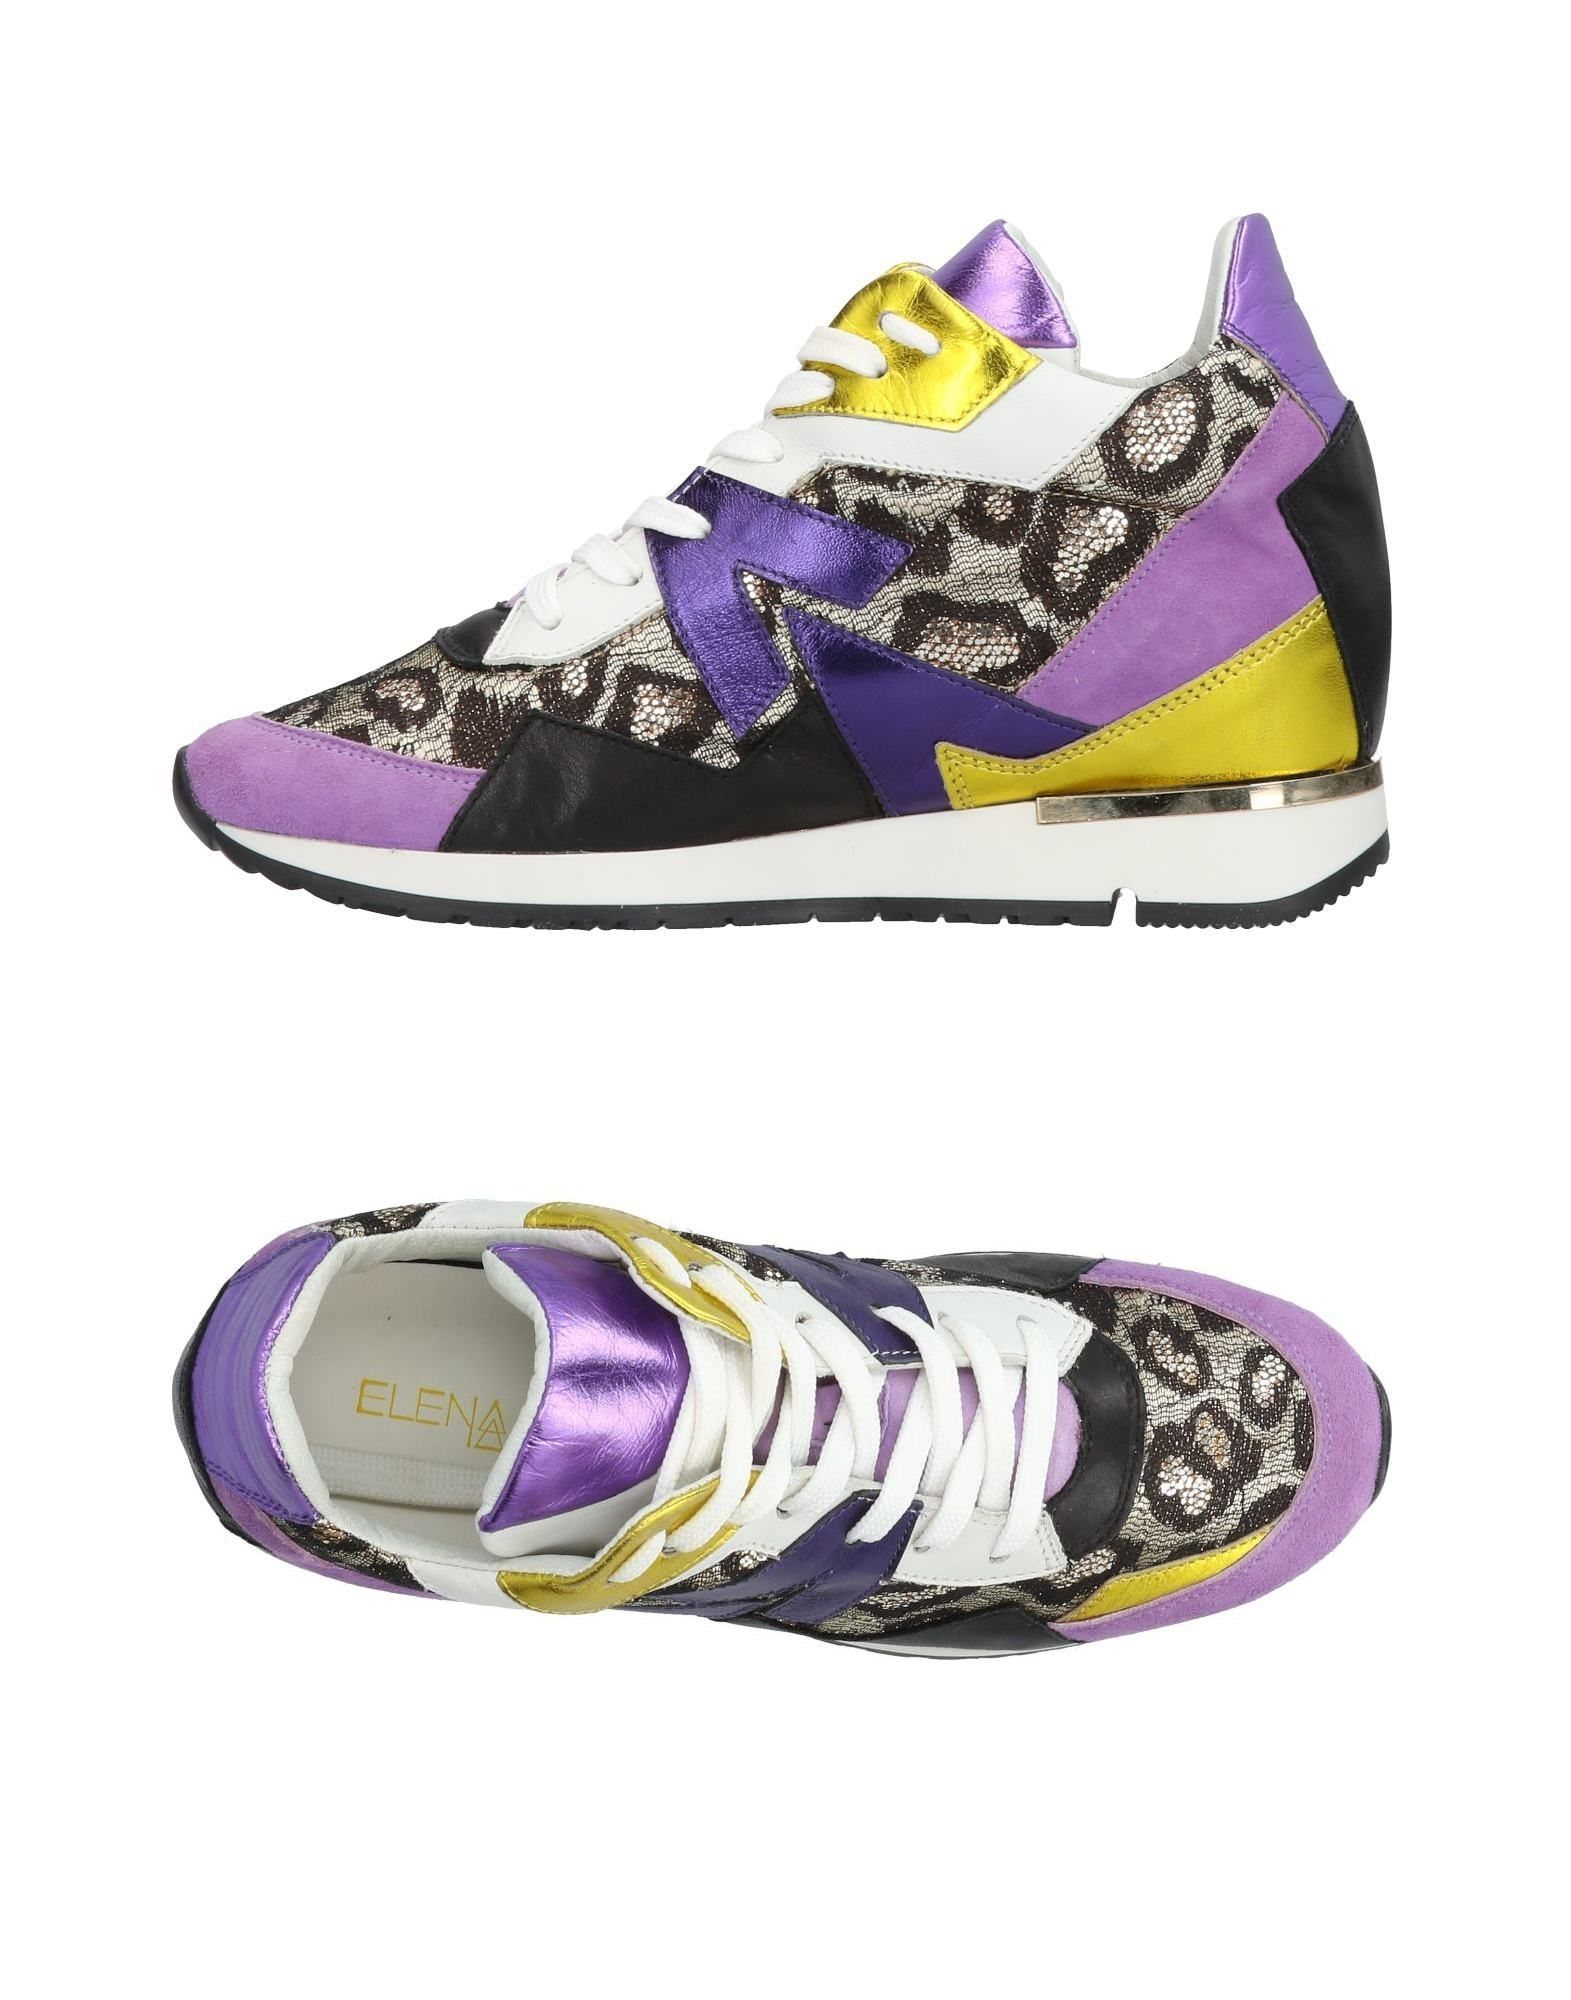 Elena Iachi Sneakers Damen  Gute 11424493UB Gute  Qualität beliebte Schuhe 95c0ee